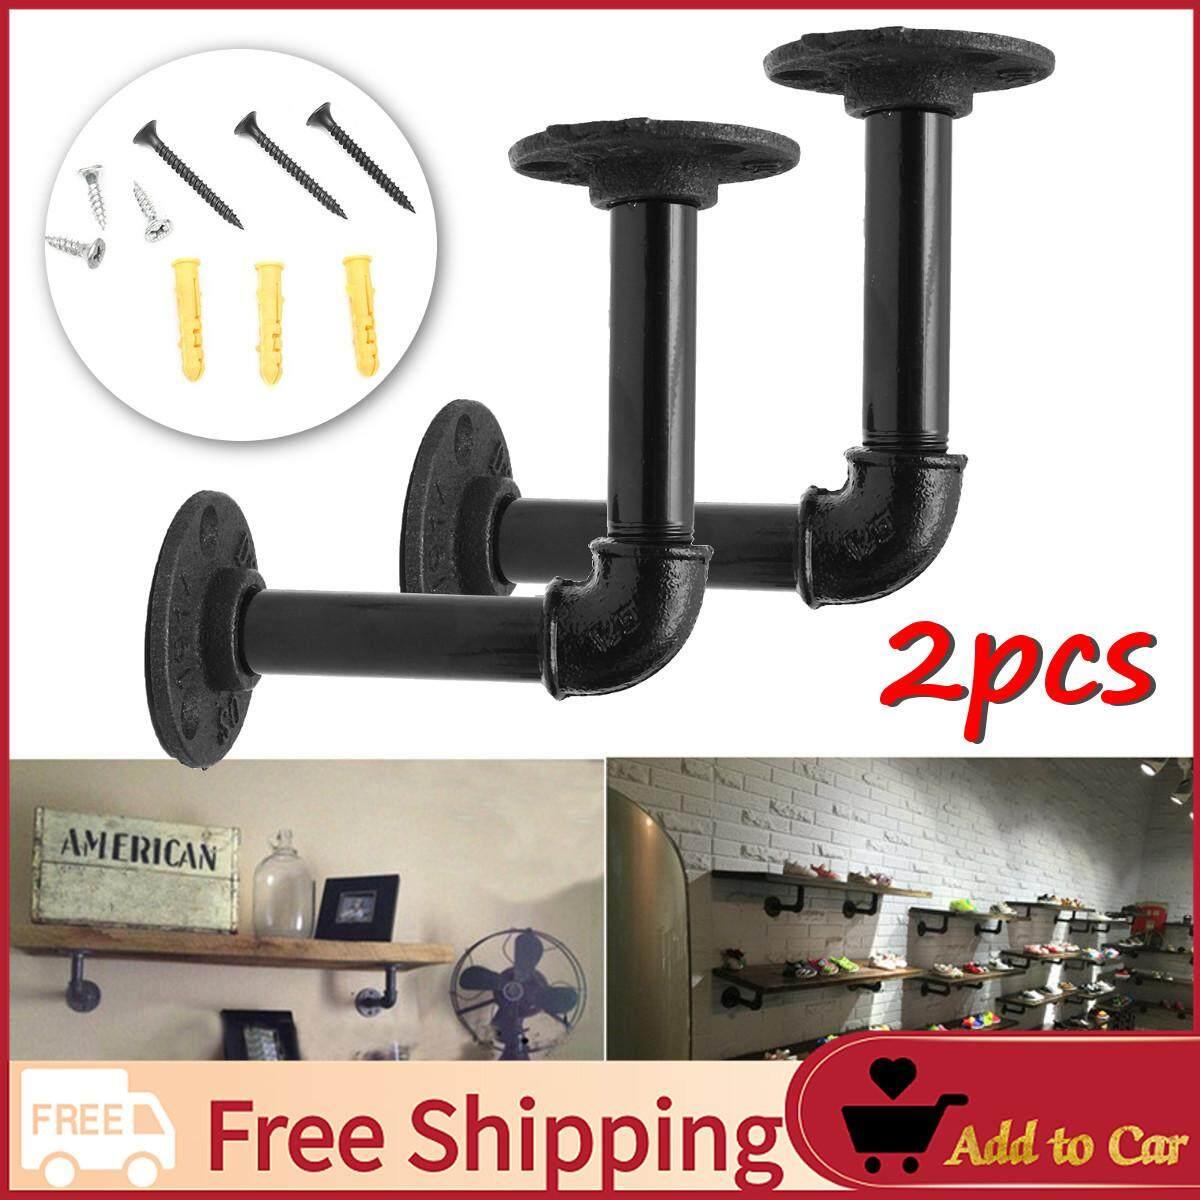 【Free Shipping】2pcs Vintage Retro Black Iron Industrial Pipe Shelf Bracket Holder With Screws